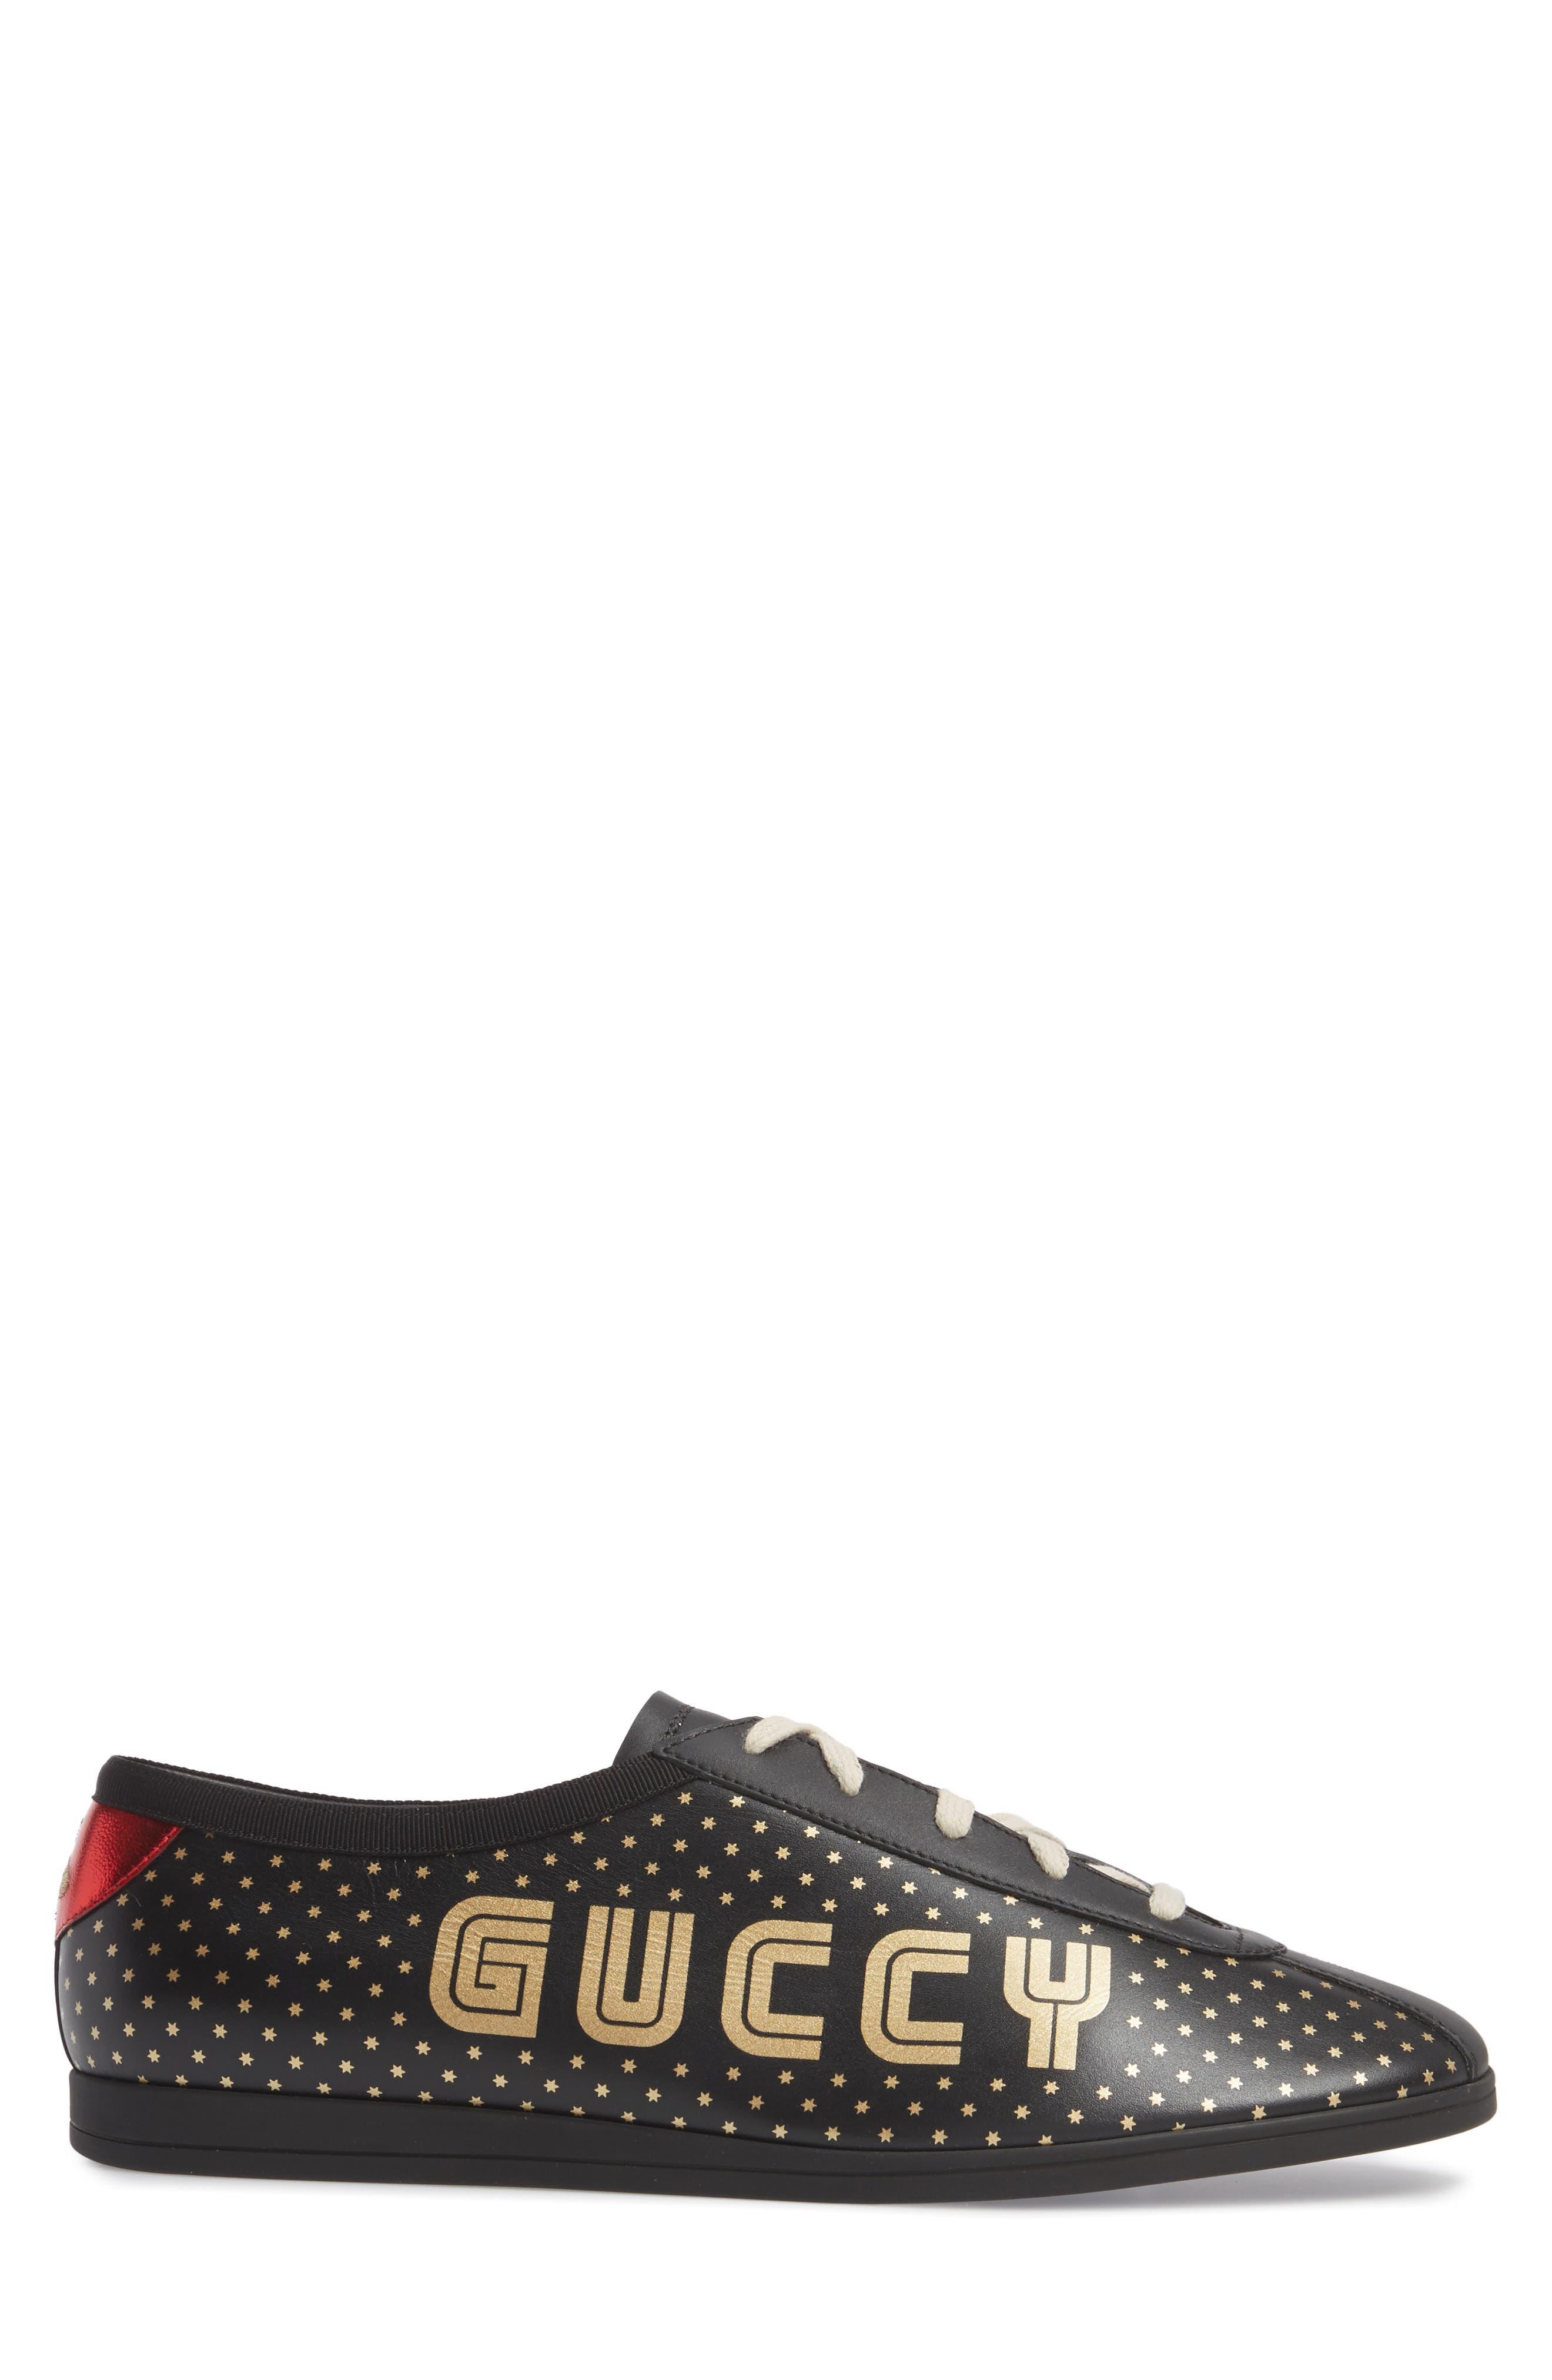 Falacer Guccy Low Top Sneaker,                             Alternate thumbnail 3, color,                             Black/ Tan